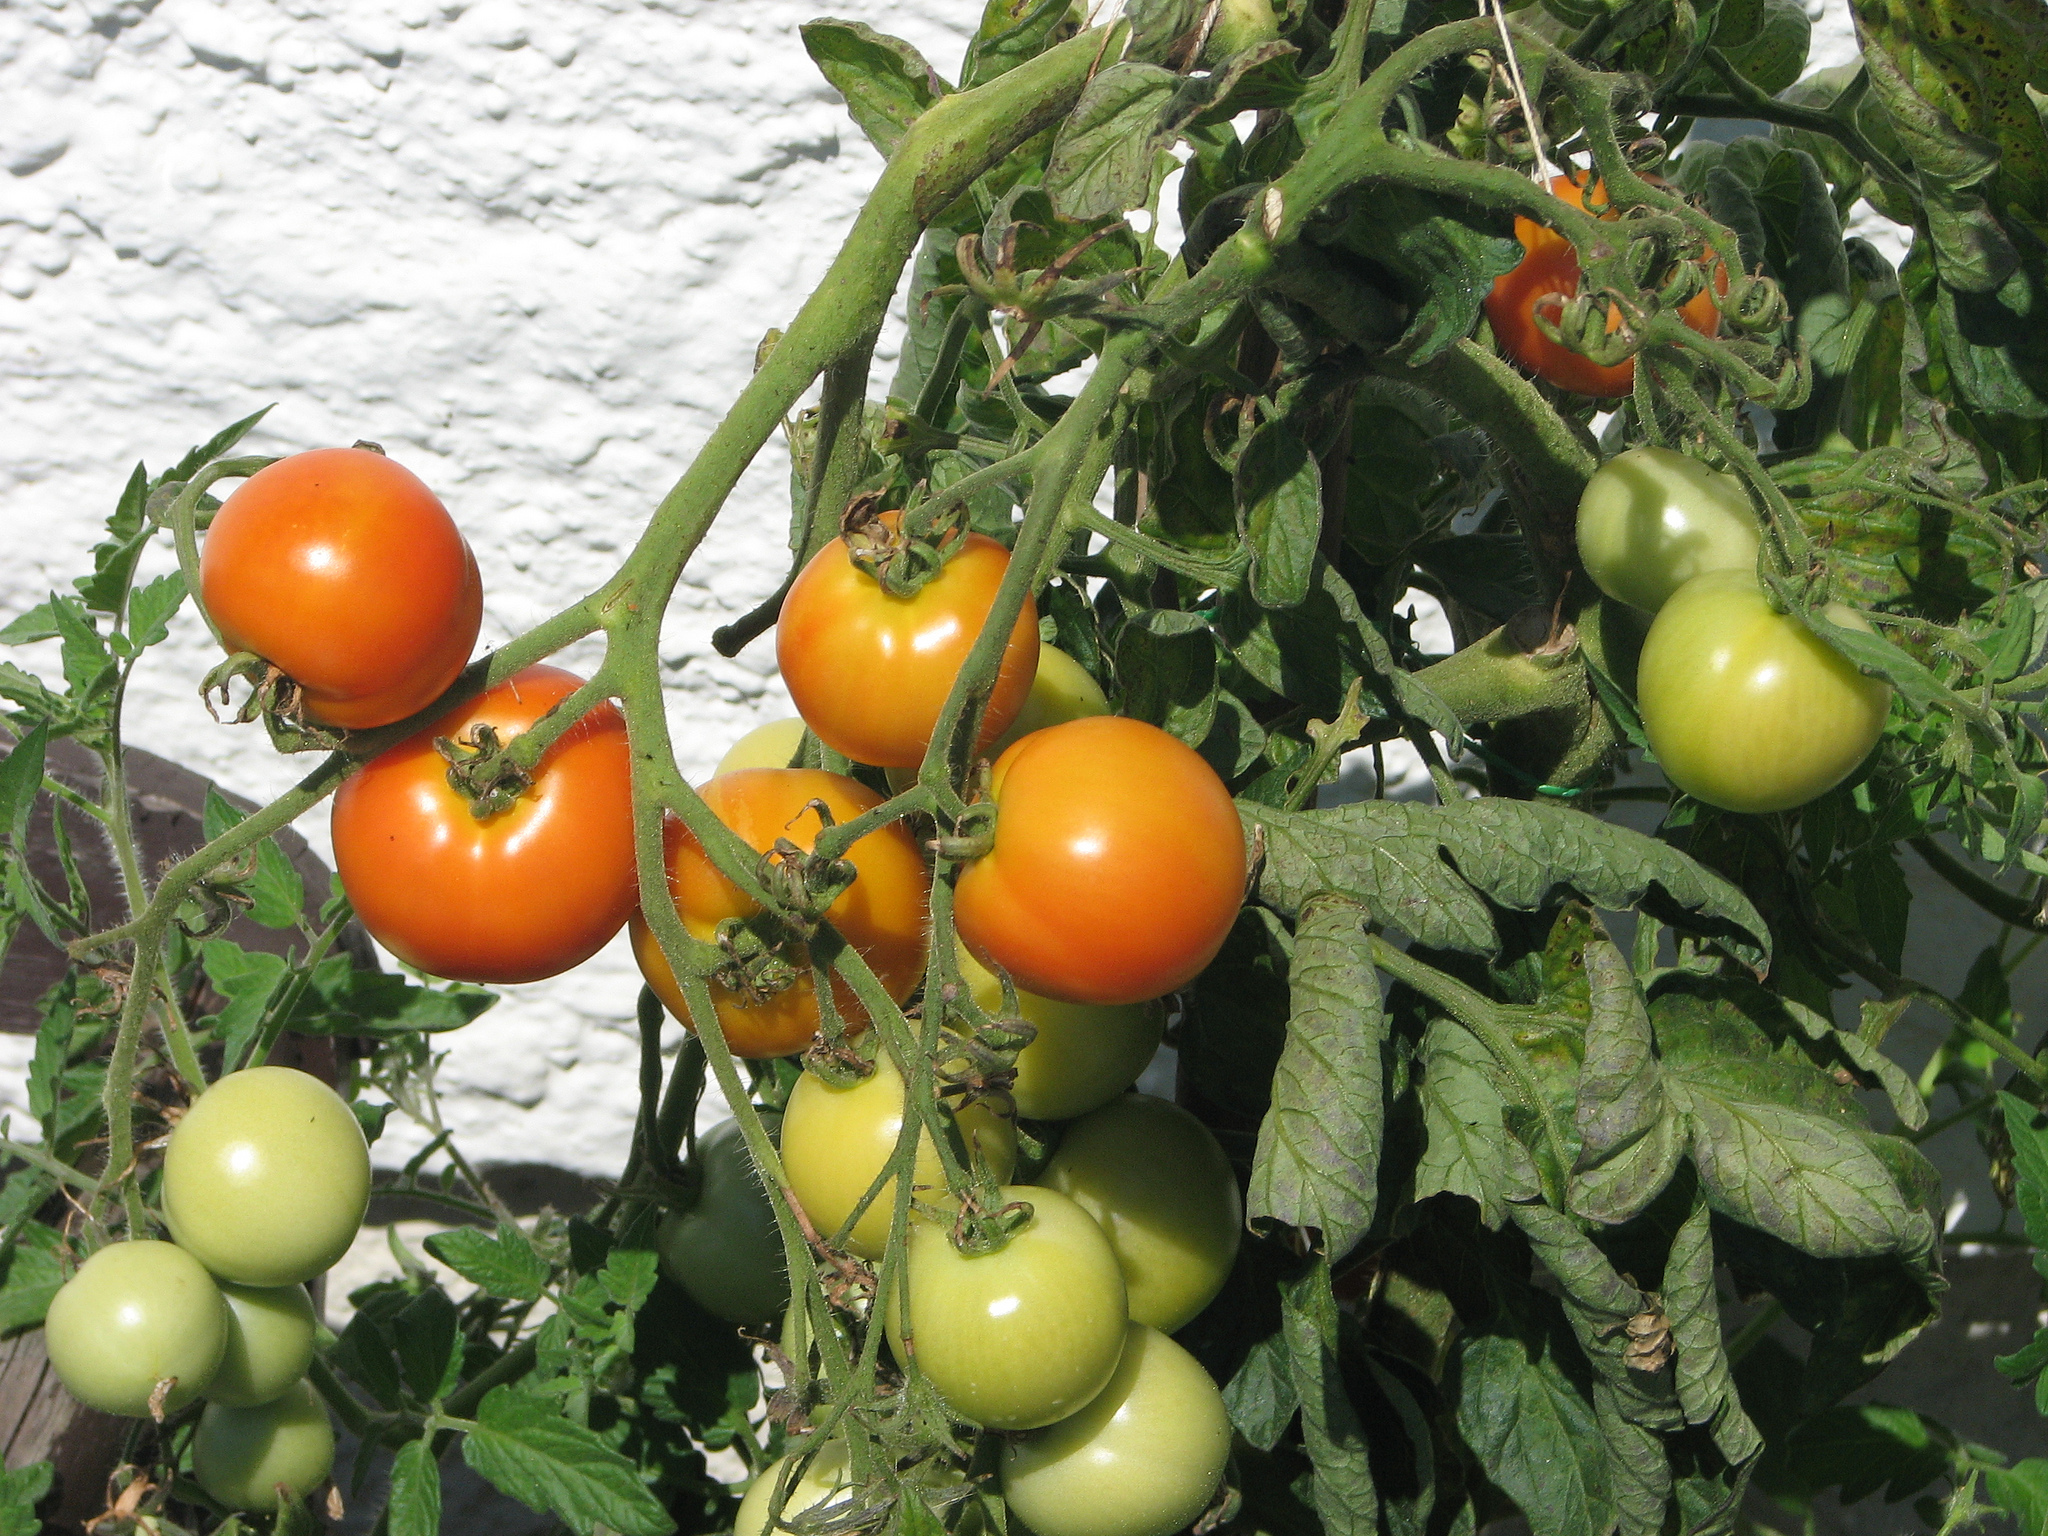 leil.de/di/pics/tomaten_gruen_rot_12.jpg